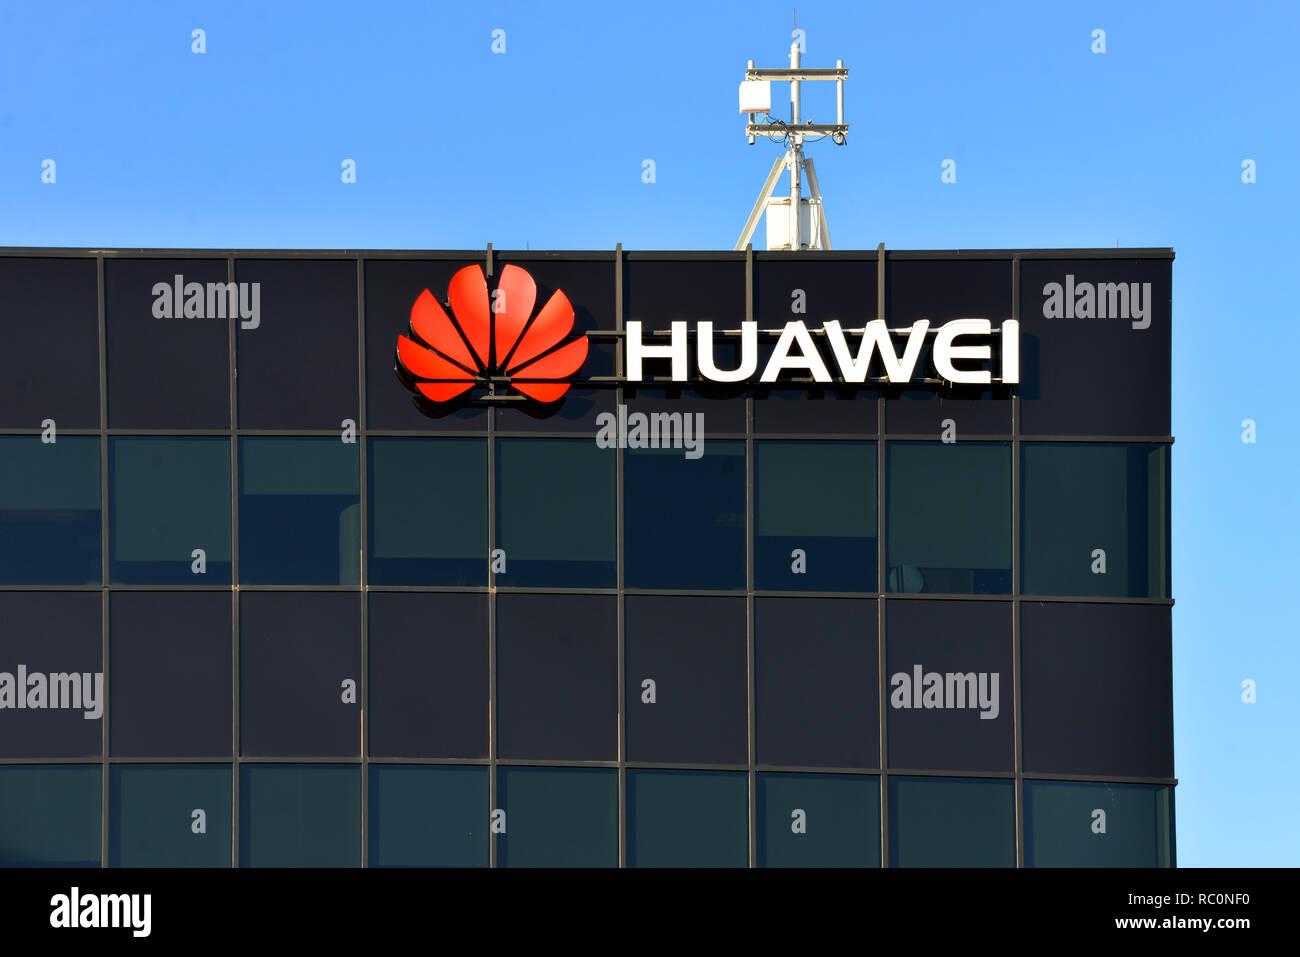 Kanata, Canada - January 12, 2019: Huawei Ottawa Research & Development Centre on Terry Fox Road. The Chinese multinational telecommunications equipme - Stock Image